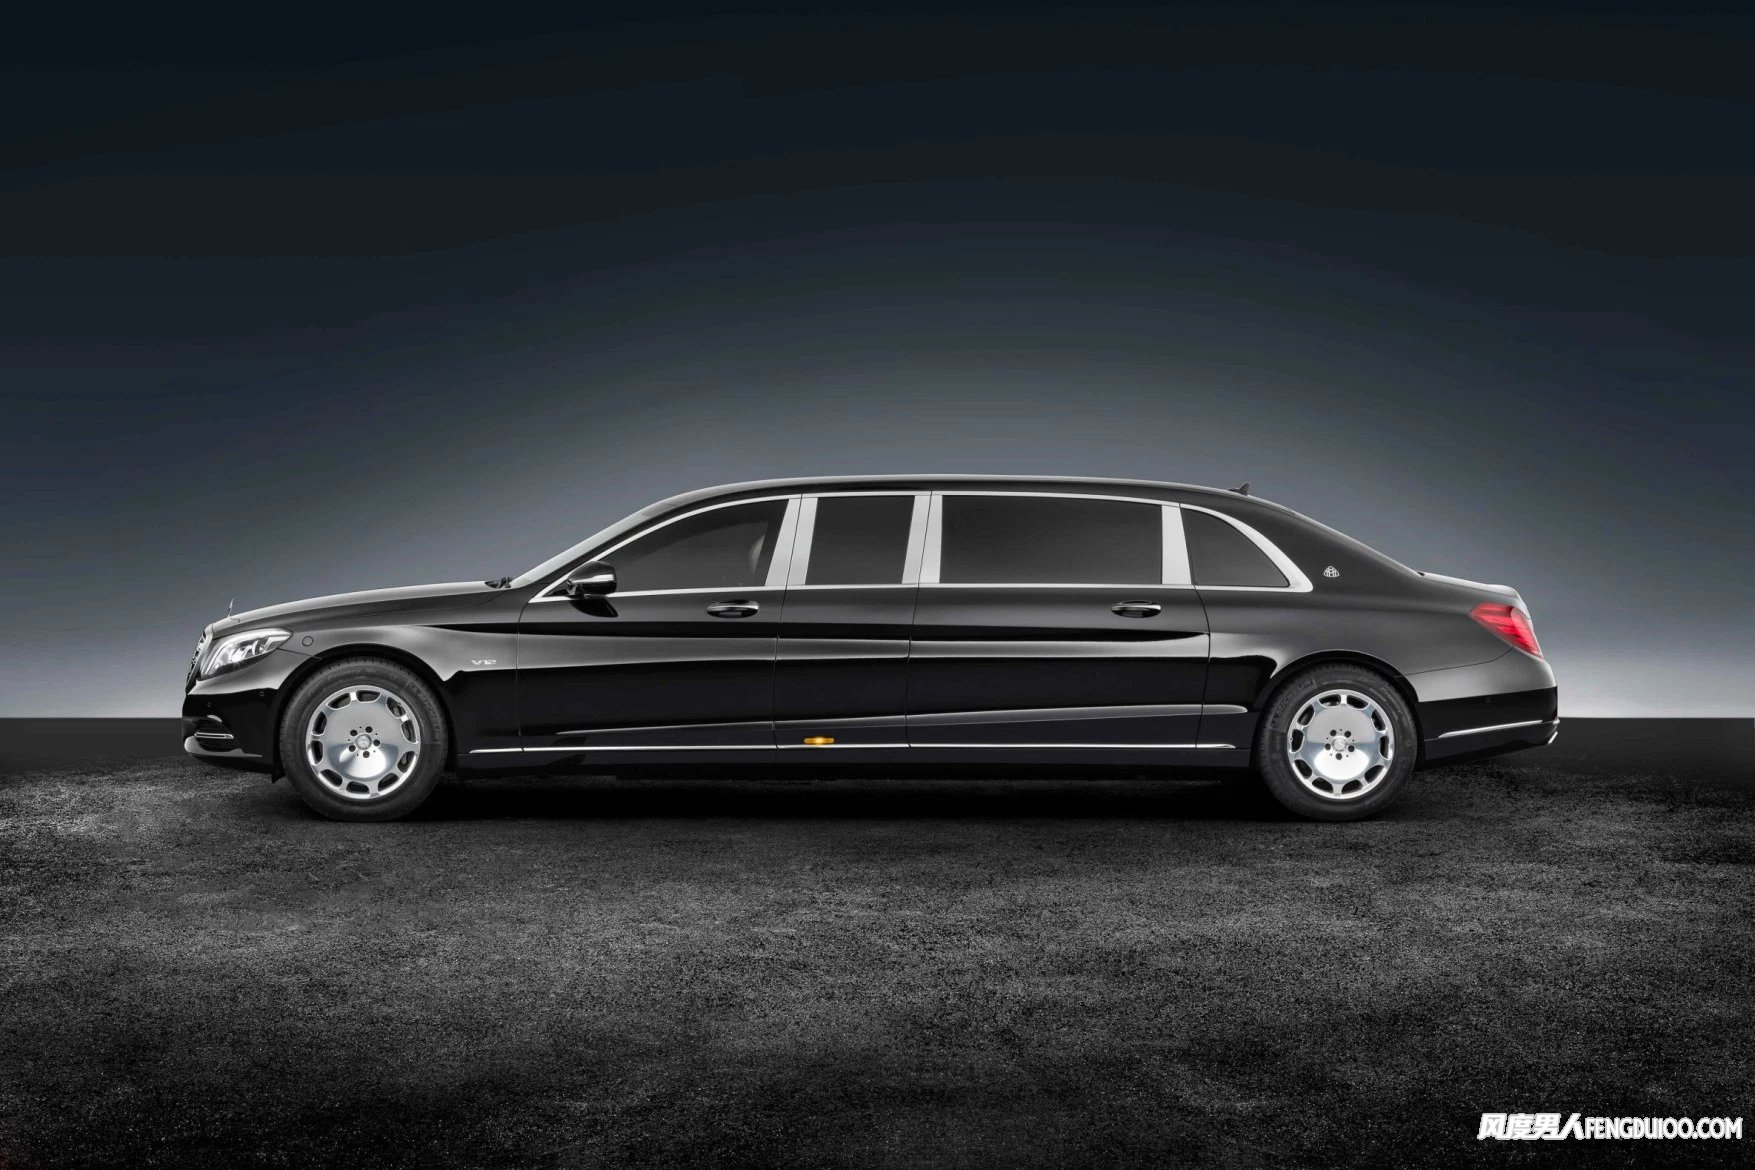 Mercedes-Maybach发布S 600 Guard 防弹版豪华轿车